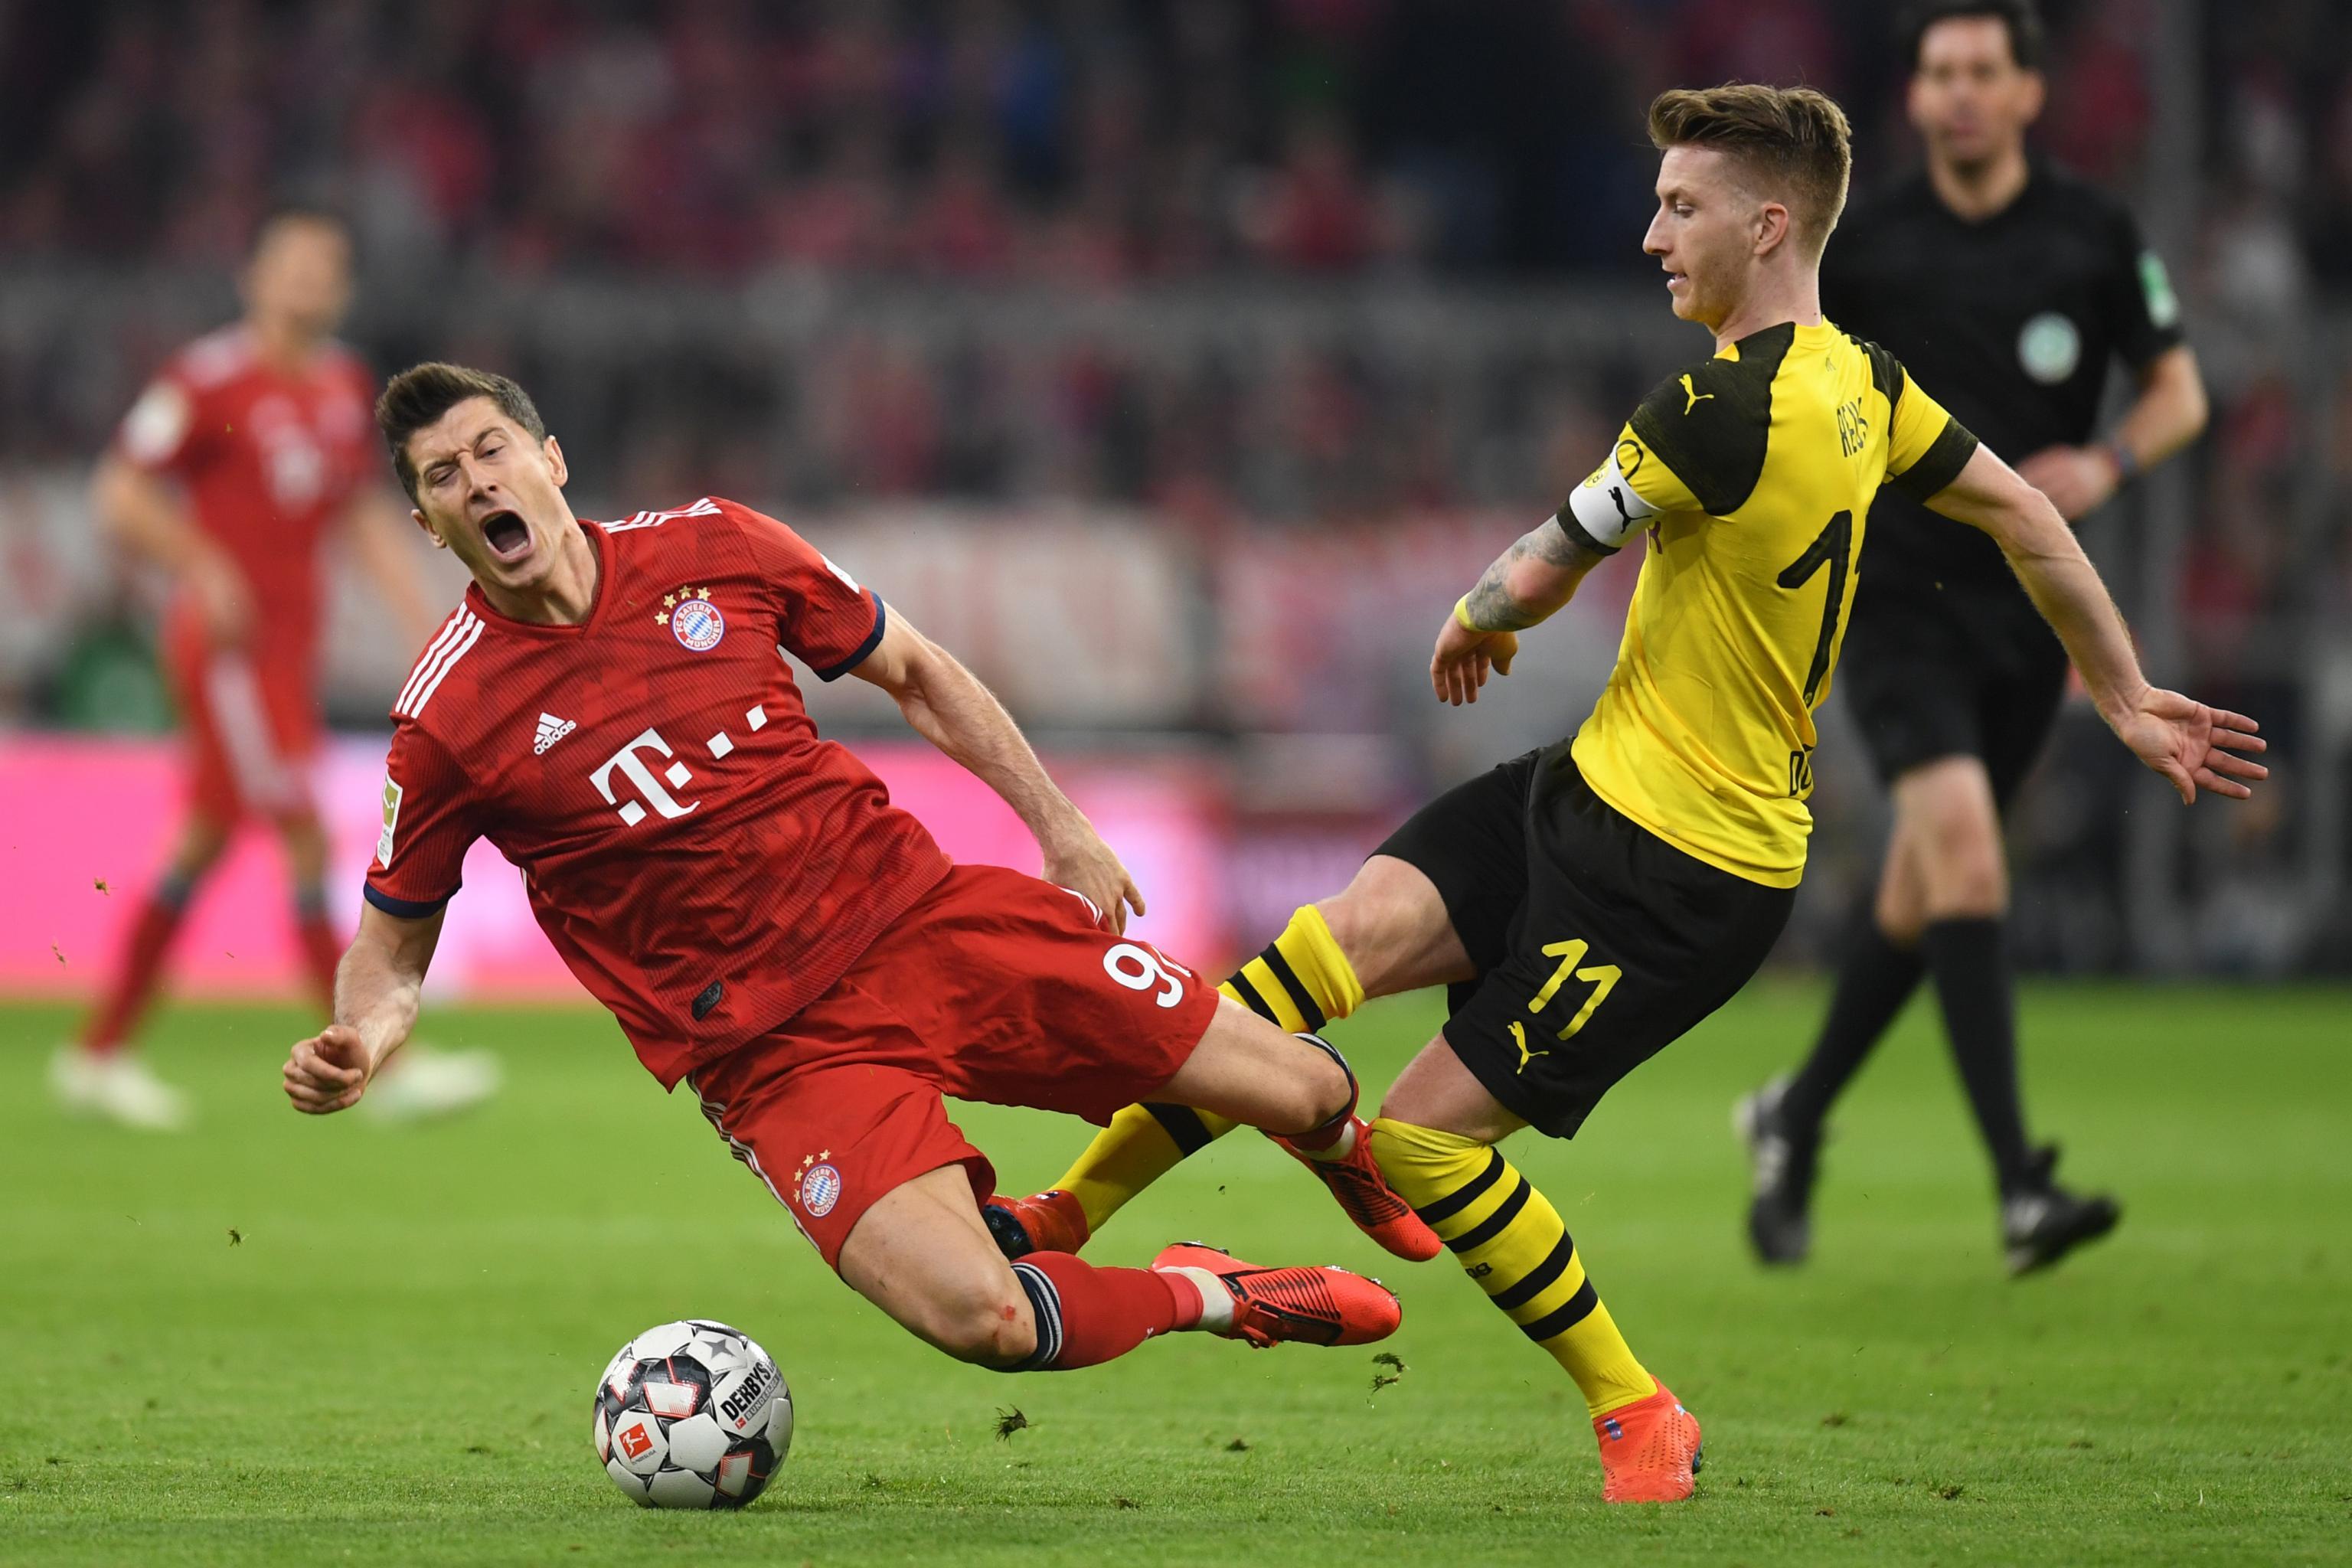 Borussia Dortmund Vs Bayern Munich Time Score Updates Odds Tv Channel How To Watch Free Live Stream Online 5 26 2020 Oregonlive Com